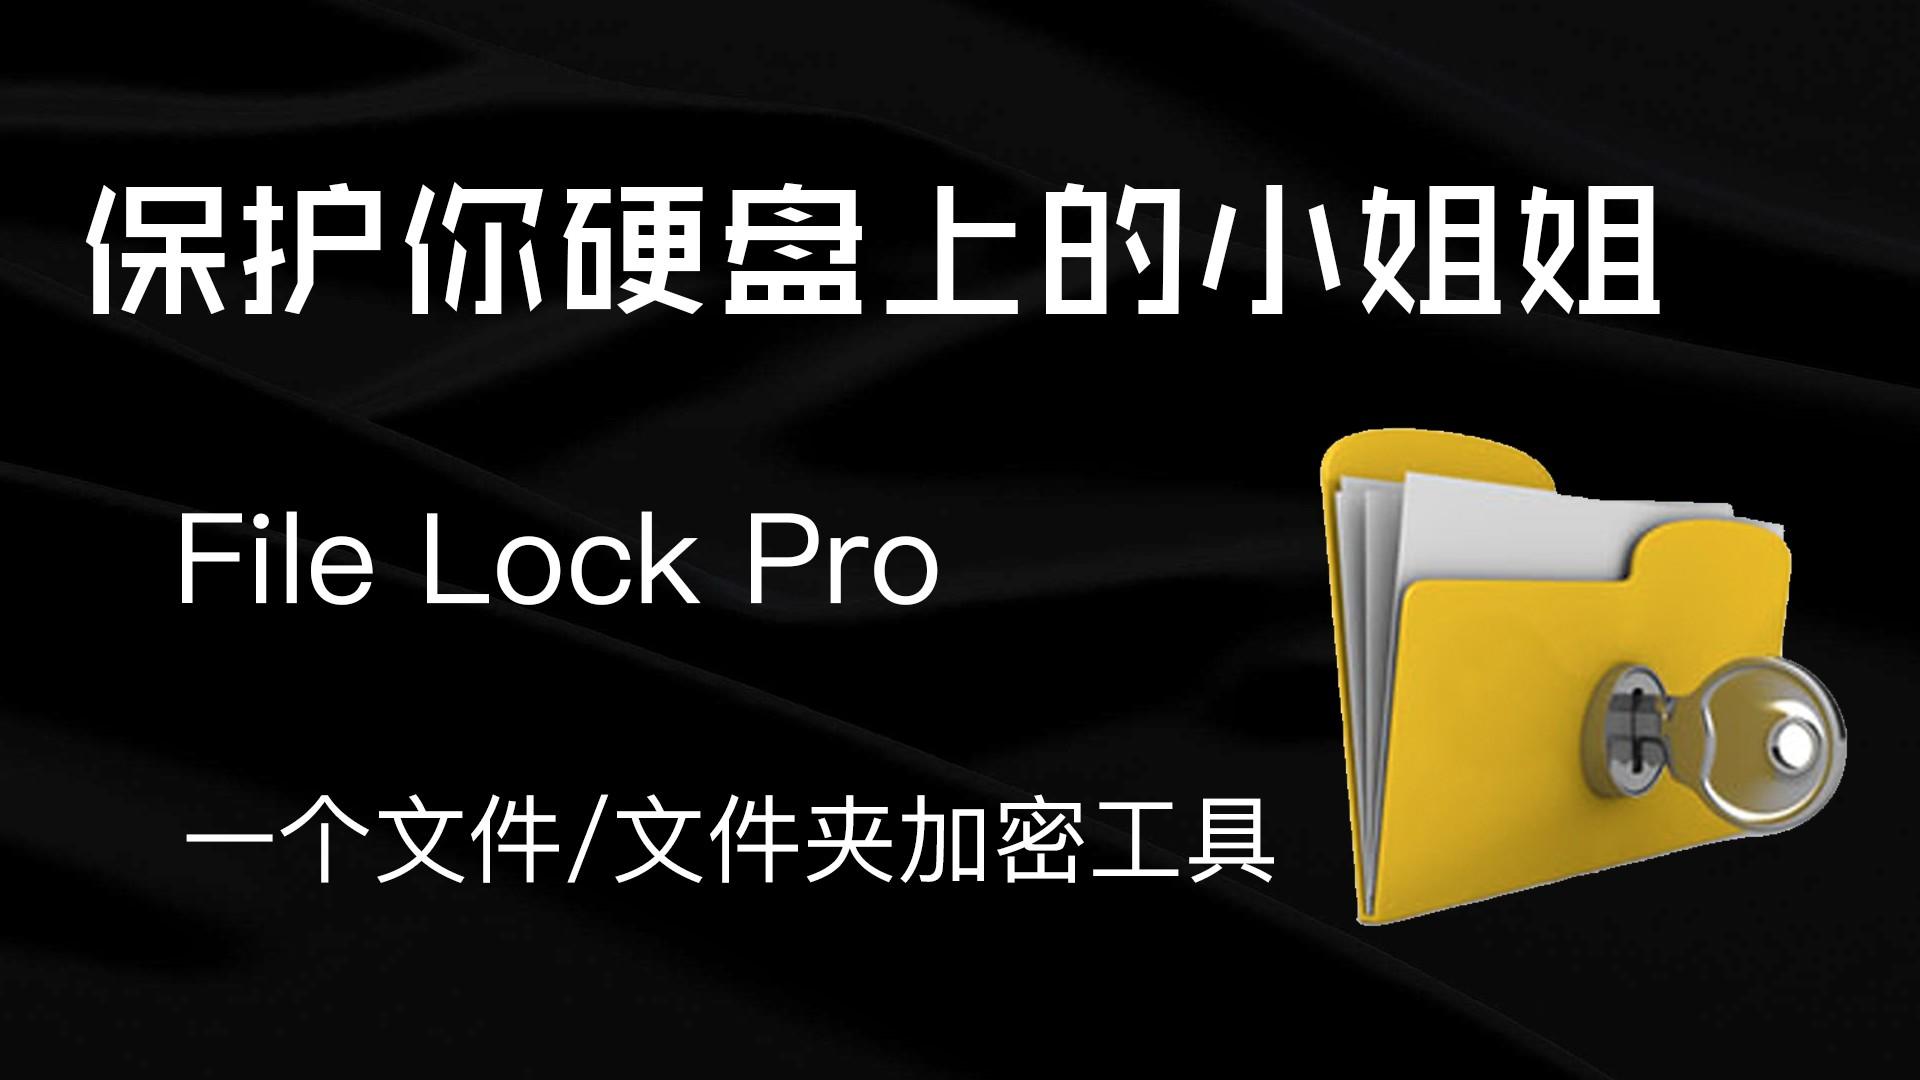 File lock Pro-一款文件和文件夹加密工具